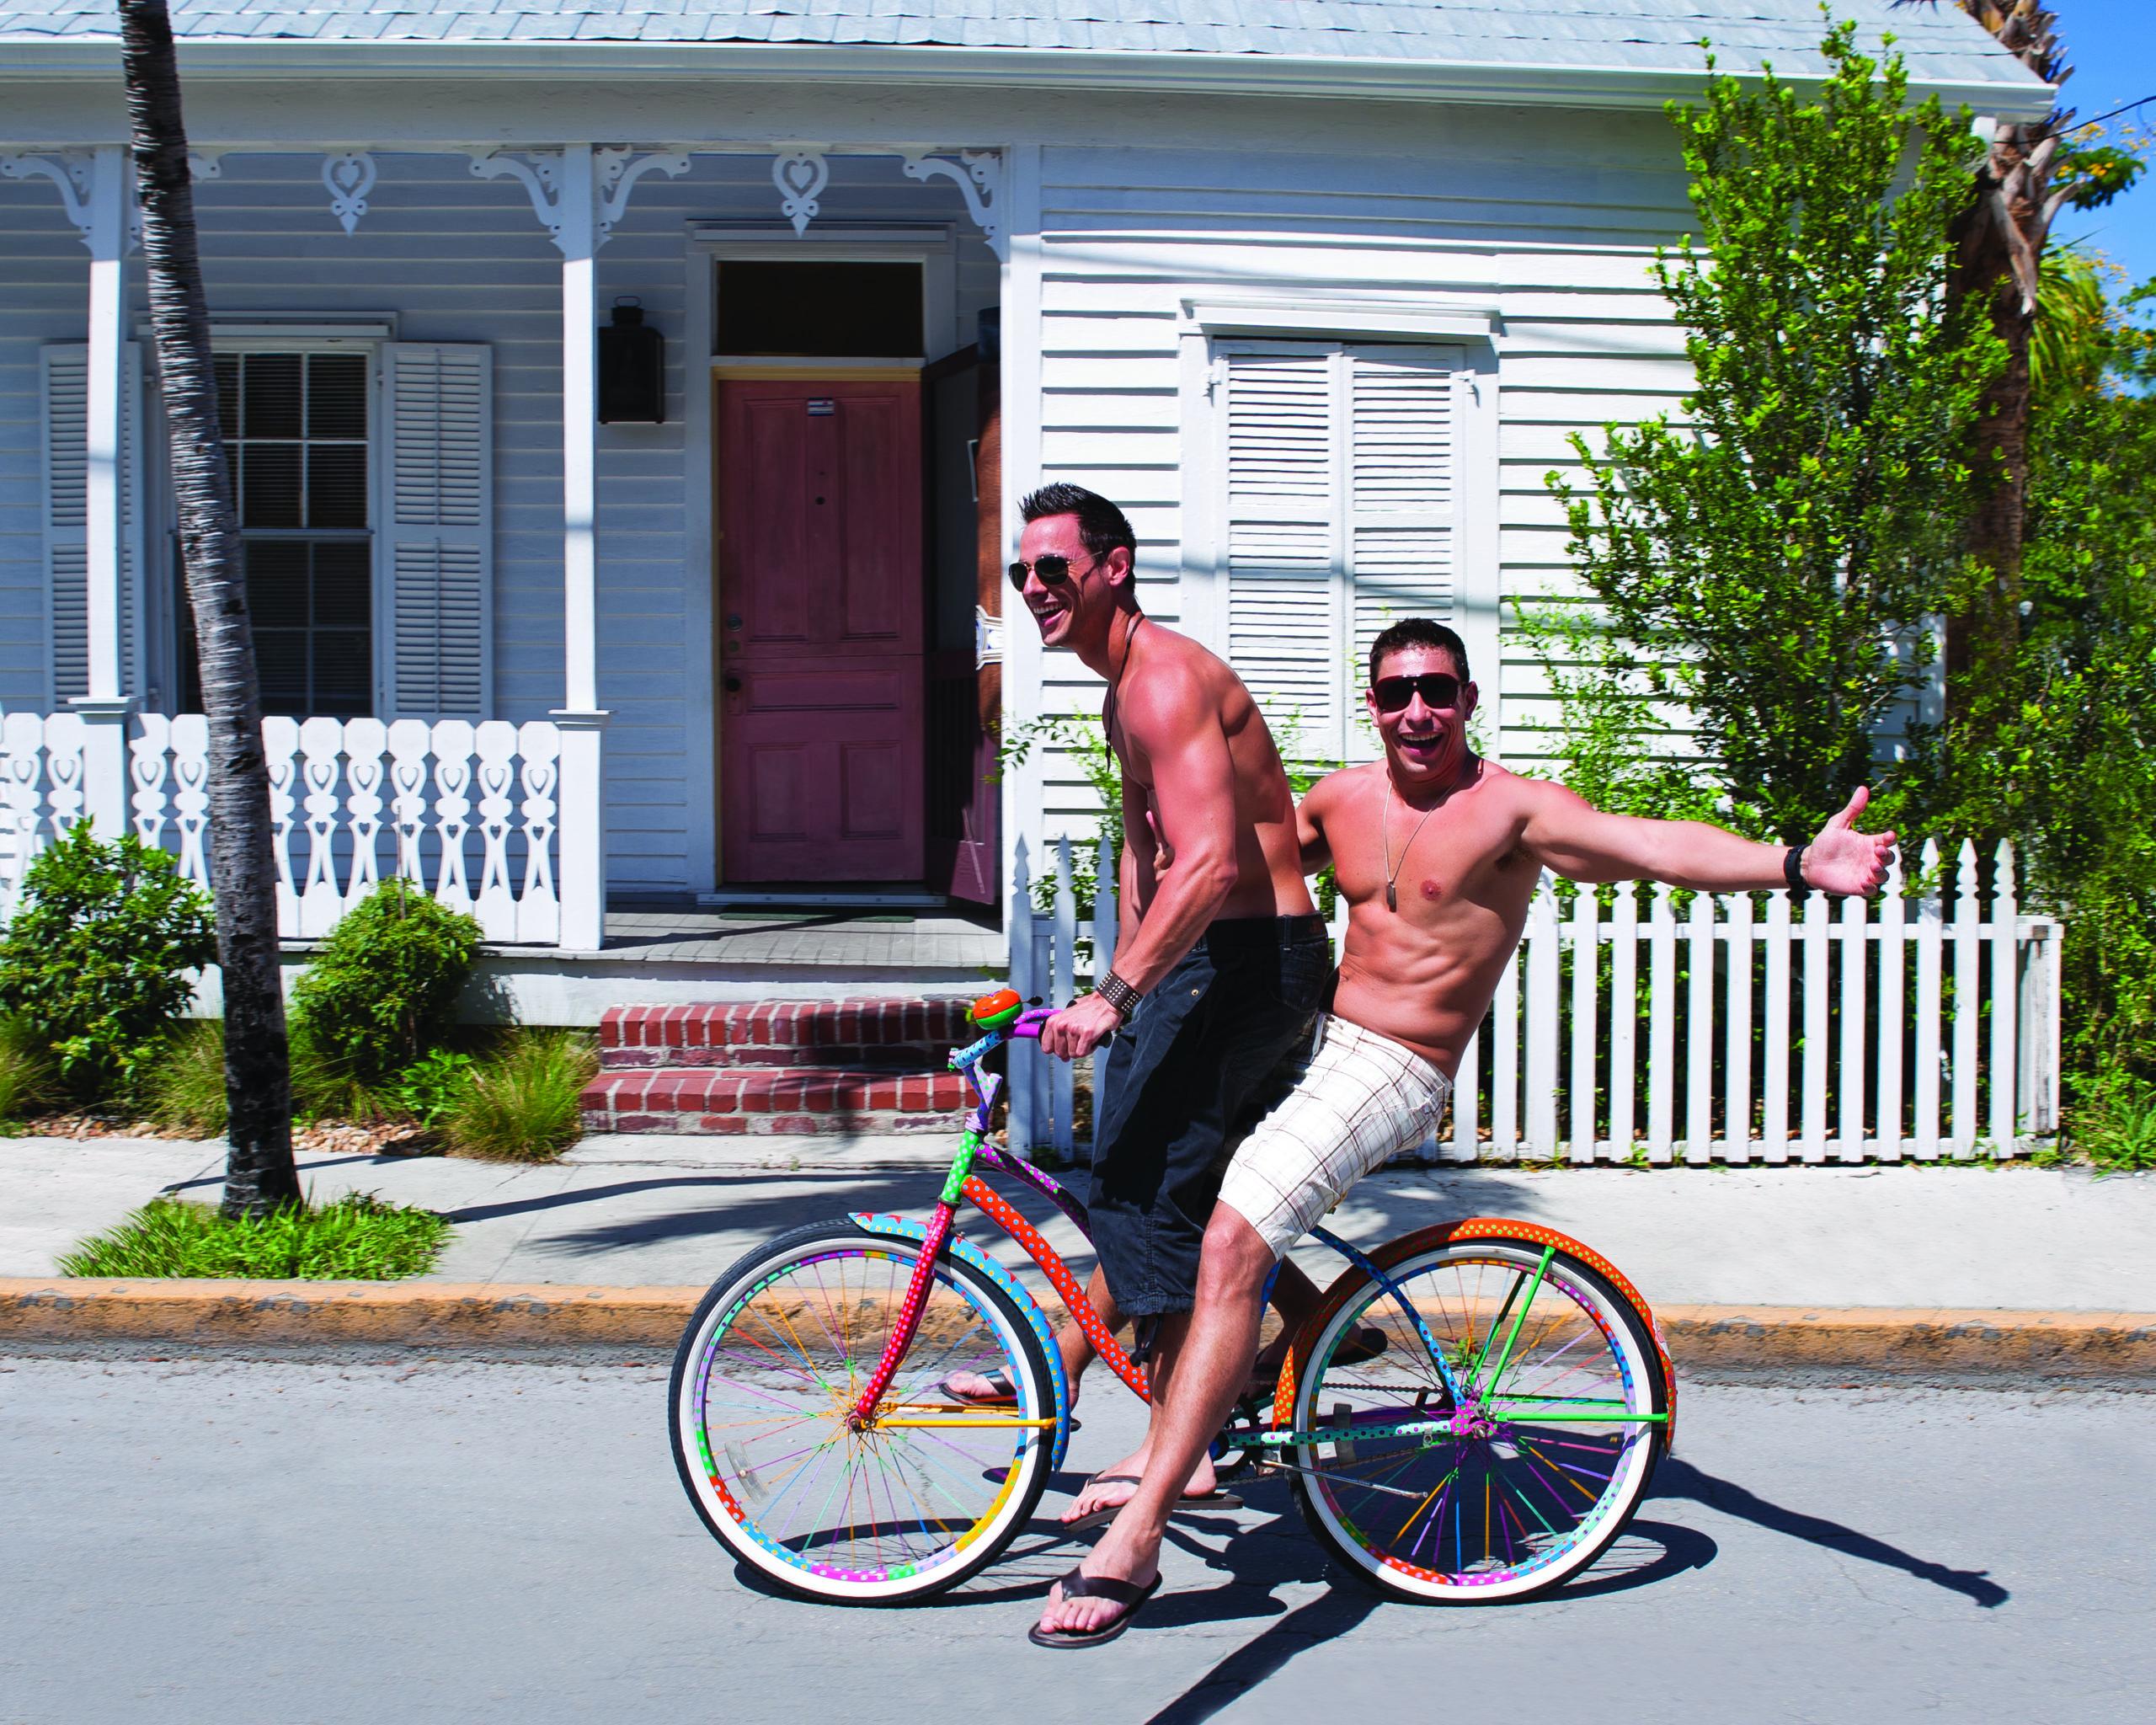 Two gay shirtless men ride a bike in Key West